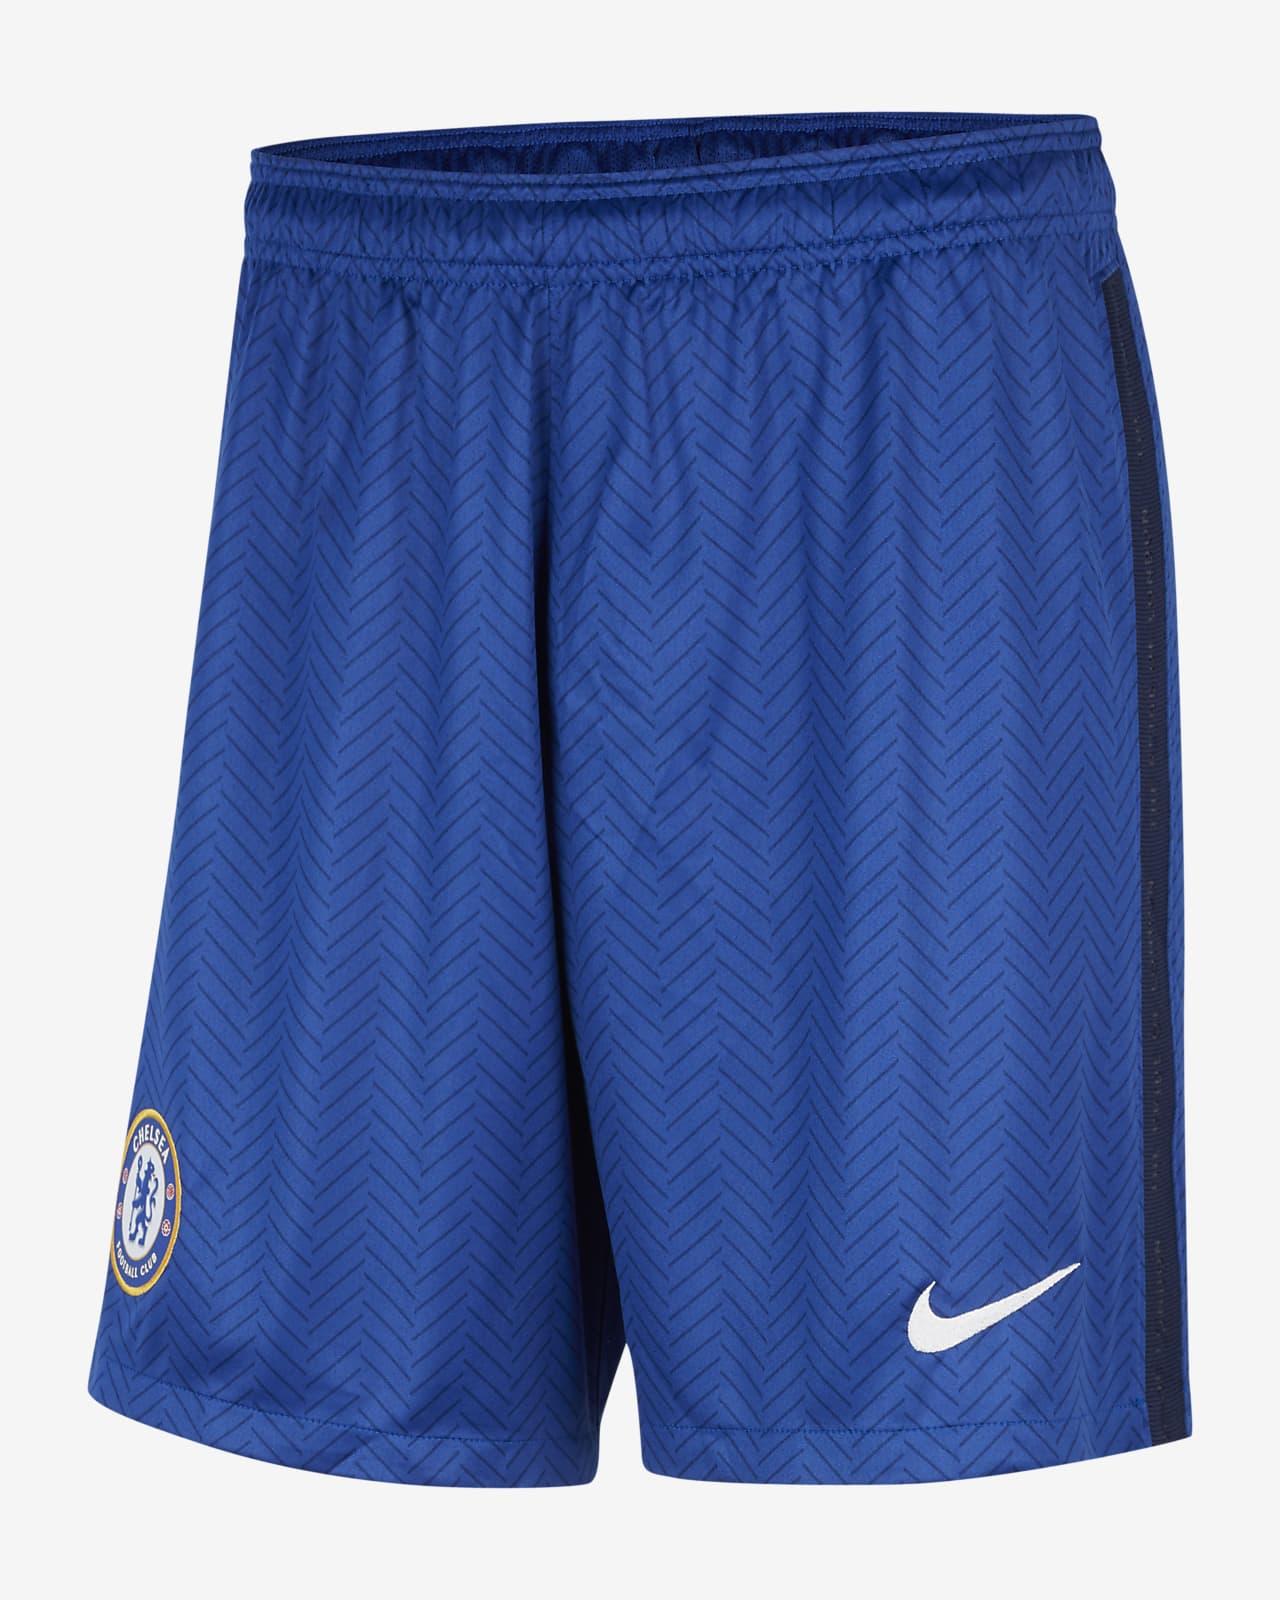 Chelsea F.C. 2020/21 Stadium Home/Away Men's Football Shorts